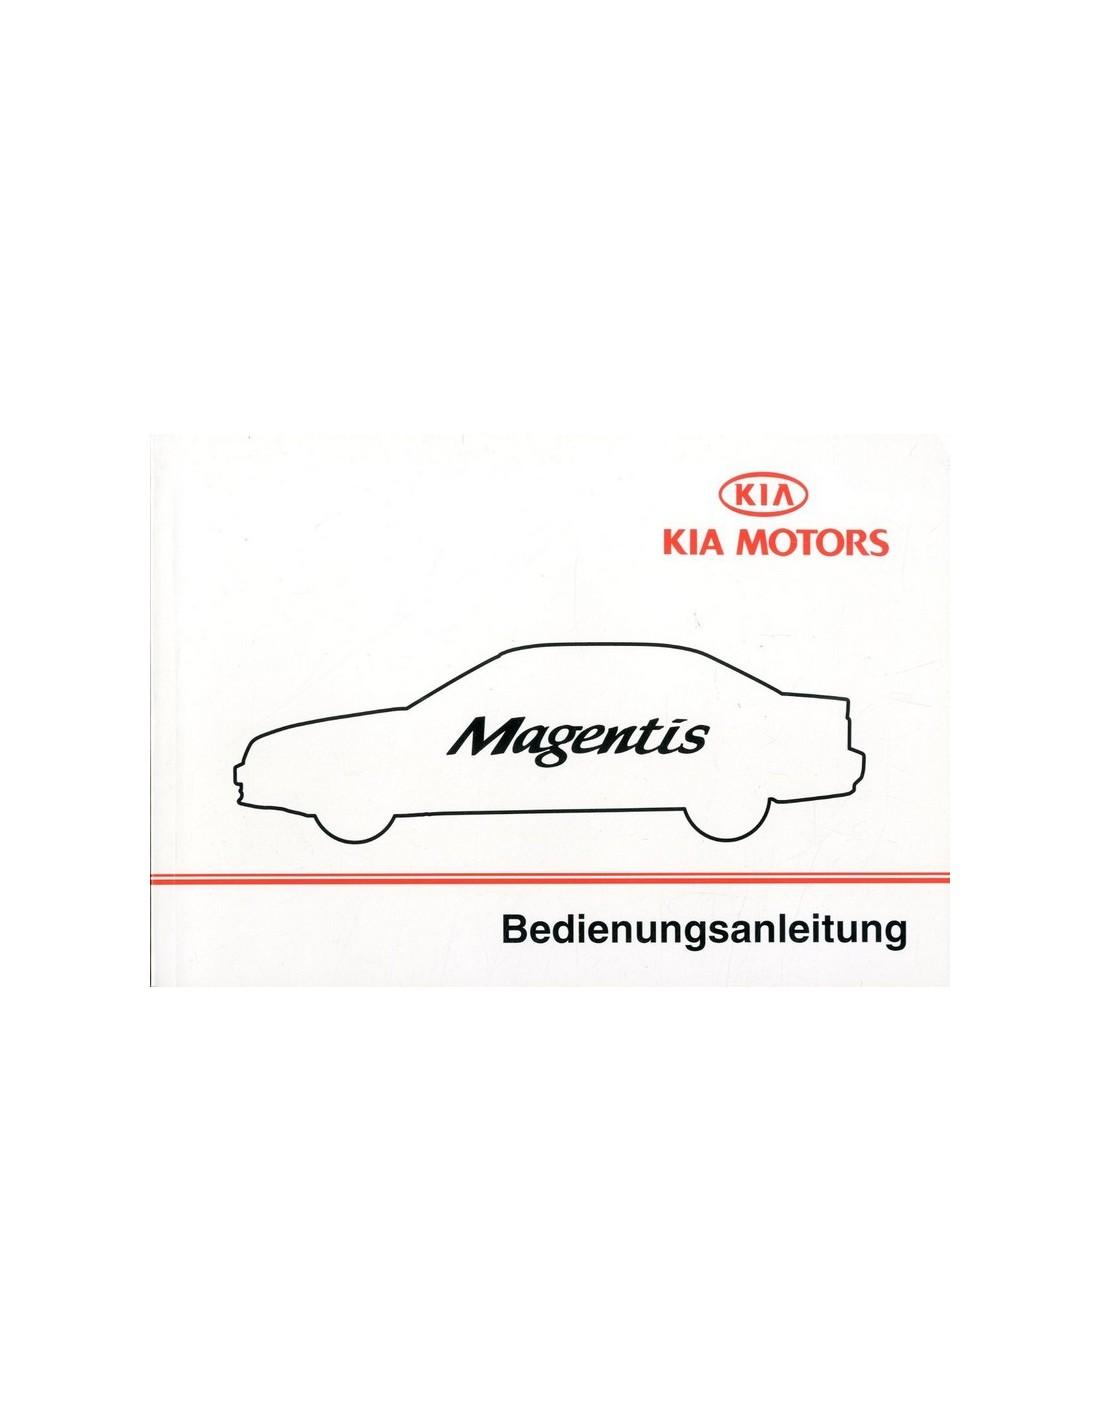 2002 kia magentis owner s manual german rh autolit eu kia magentis service manual free download kia magentis service manual free download